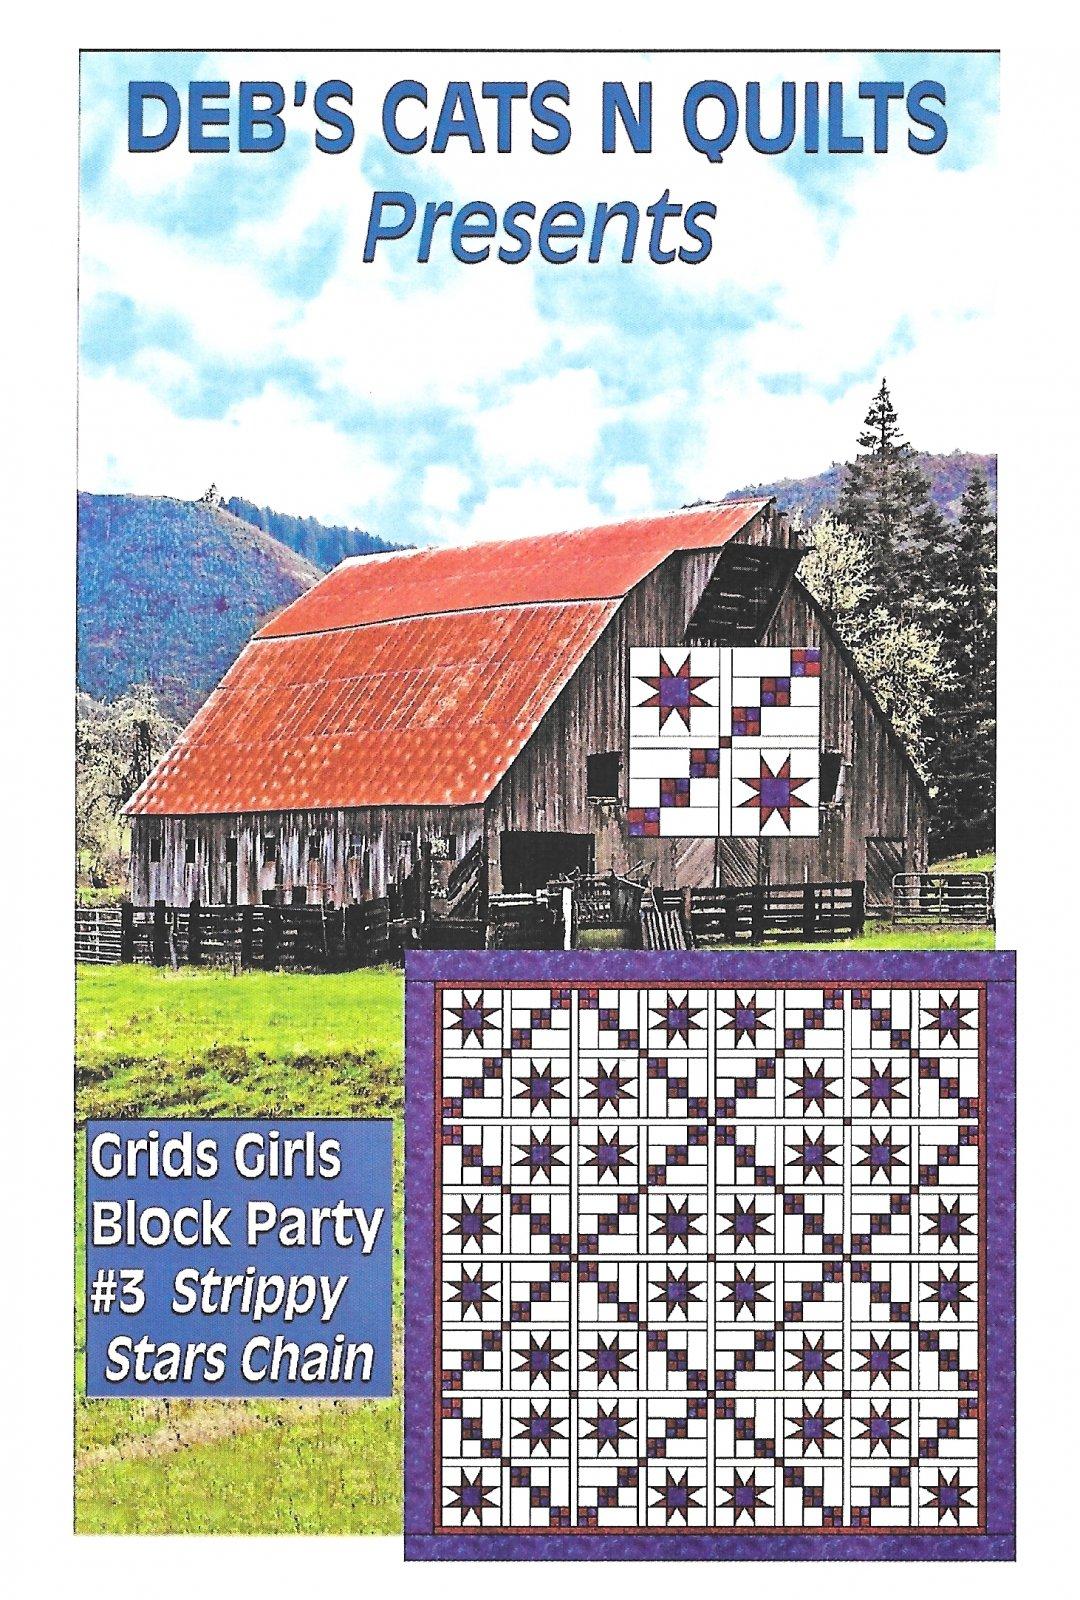 Grids Girls Block Party Patterns # 3 Strippy stars Chain